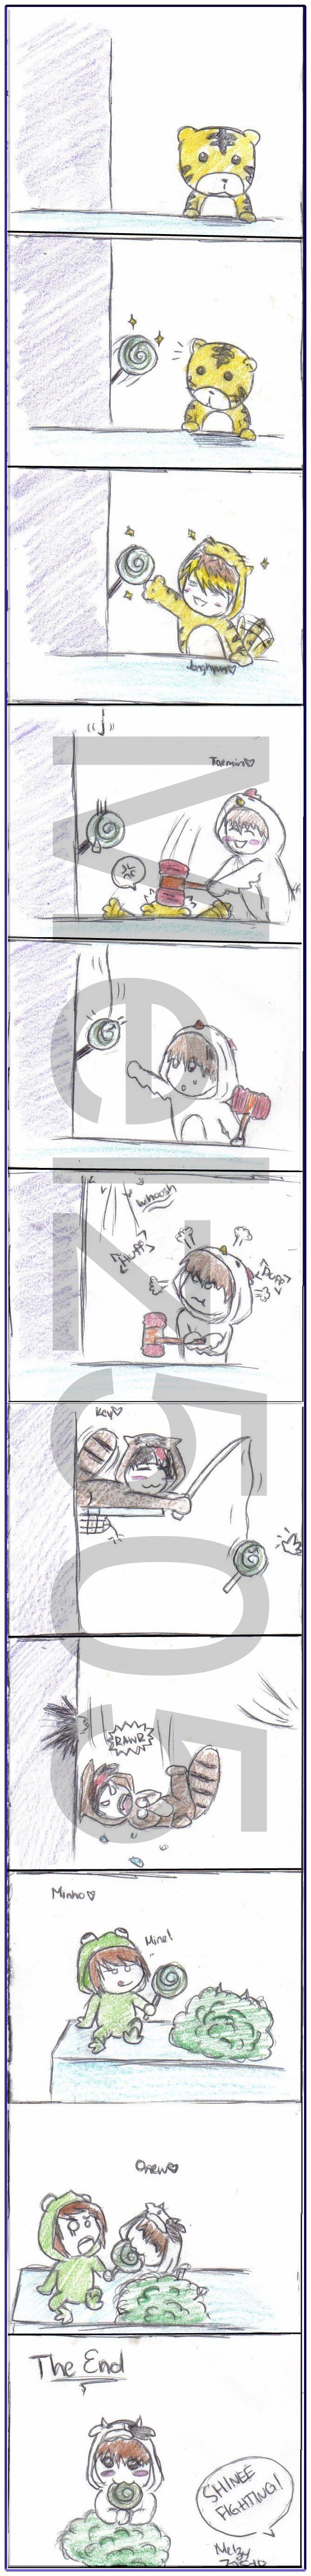 SHINee Mini Comic :D by MelzyV